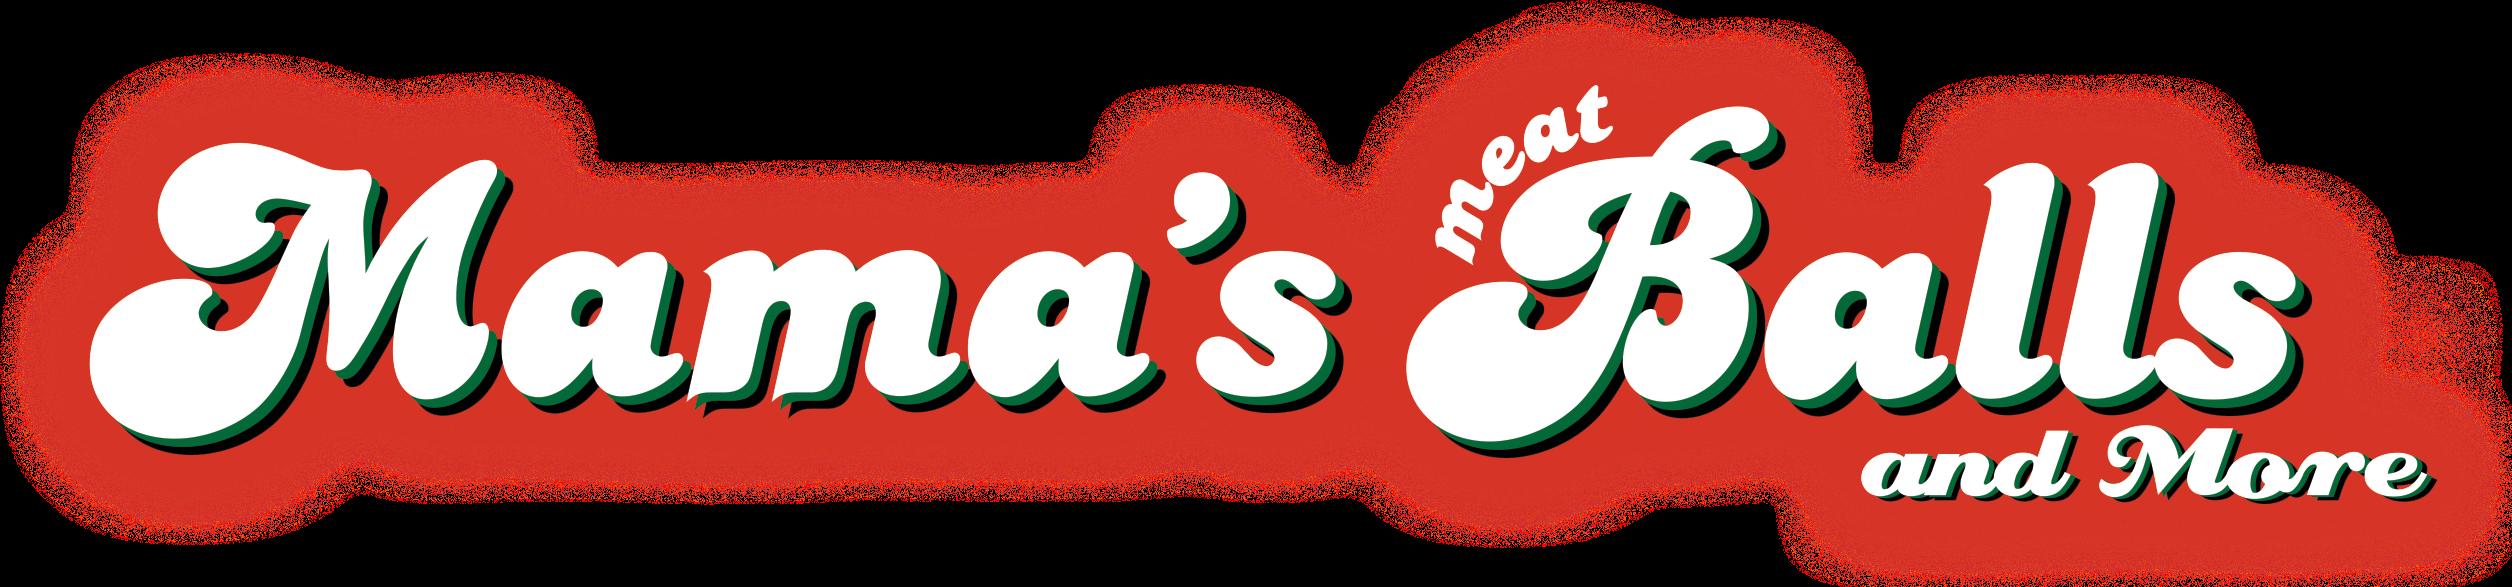 Mama's Meatballs Home